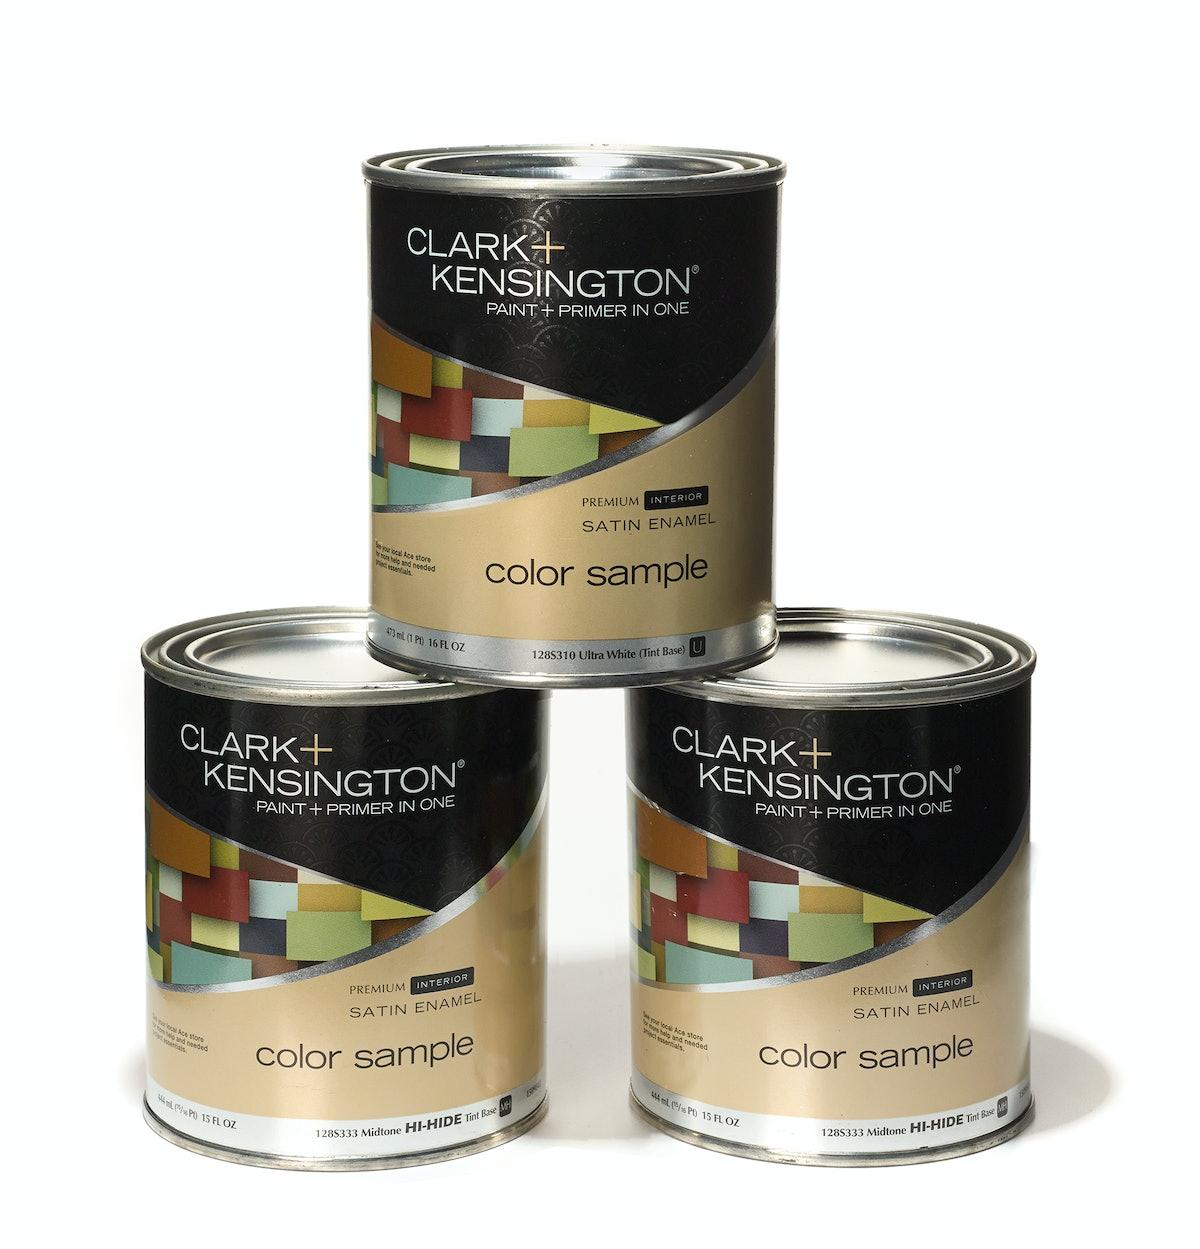 OPI Color Palette by Clark + Kensington